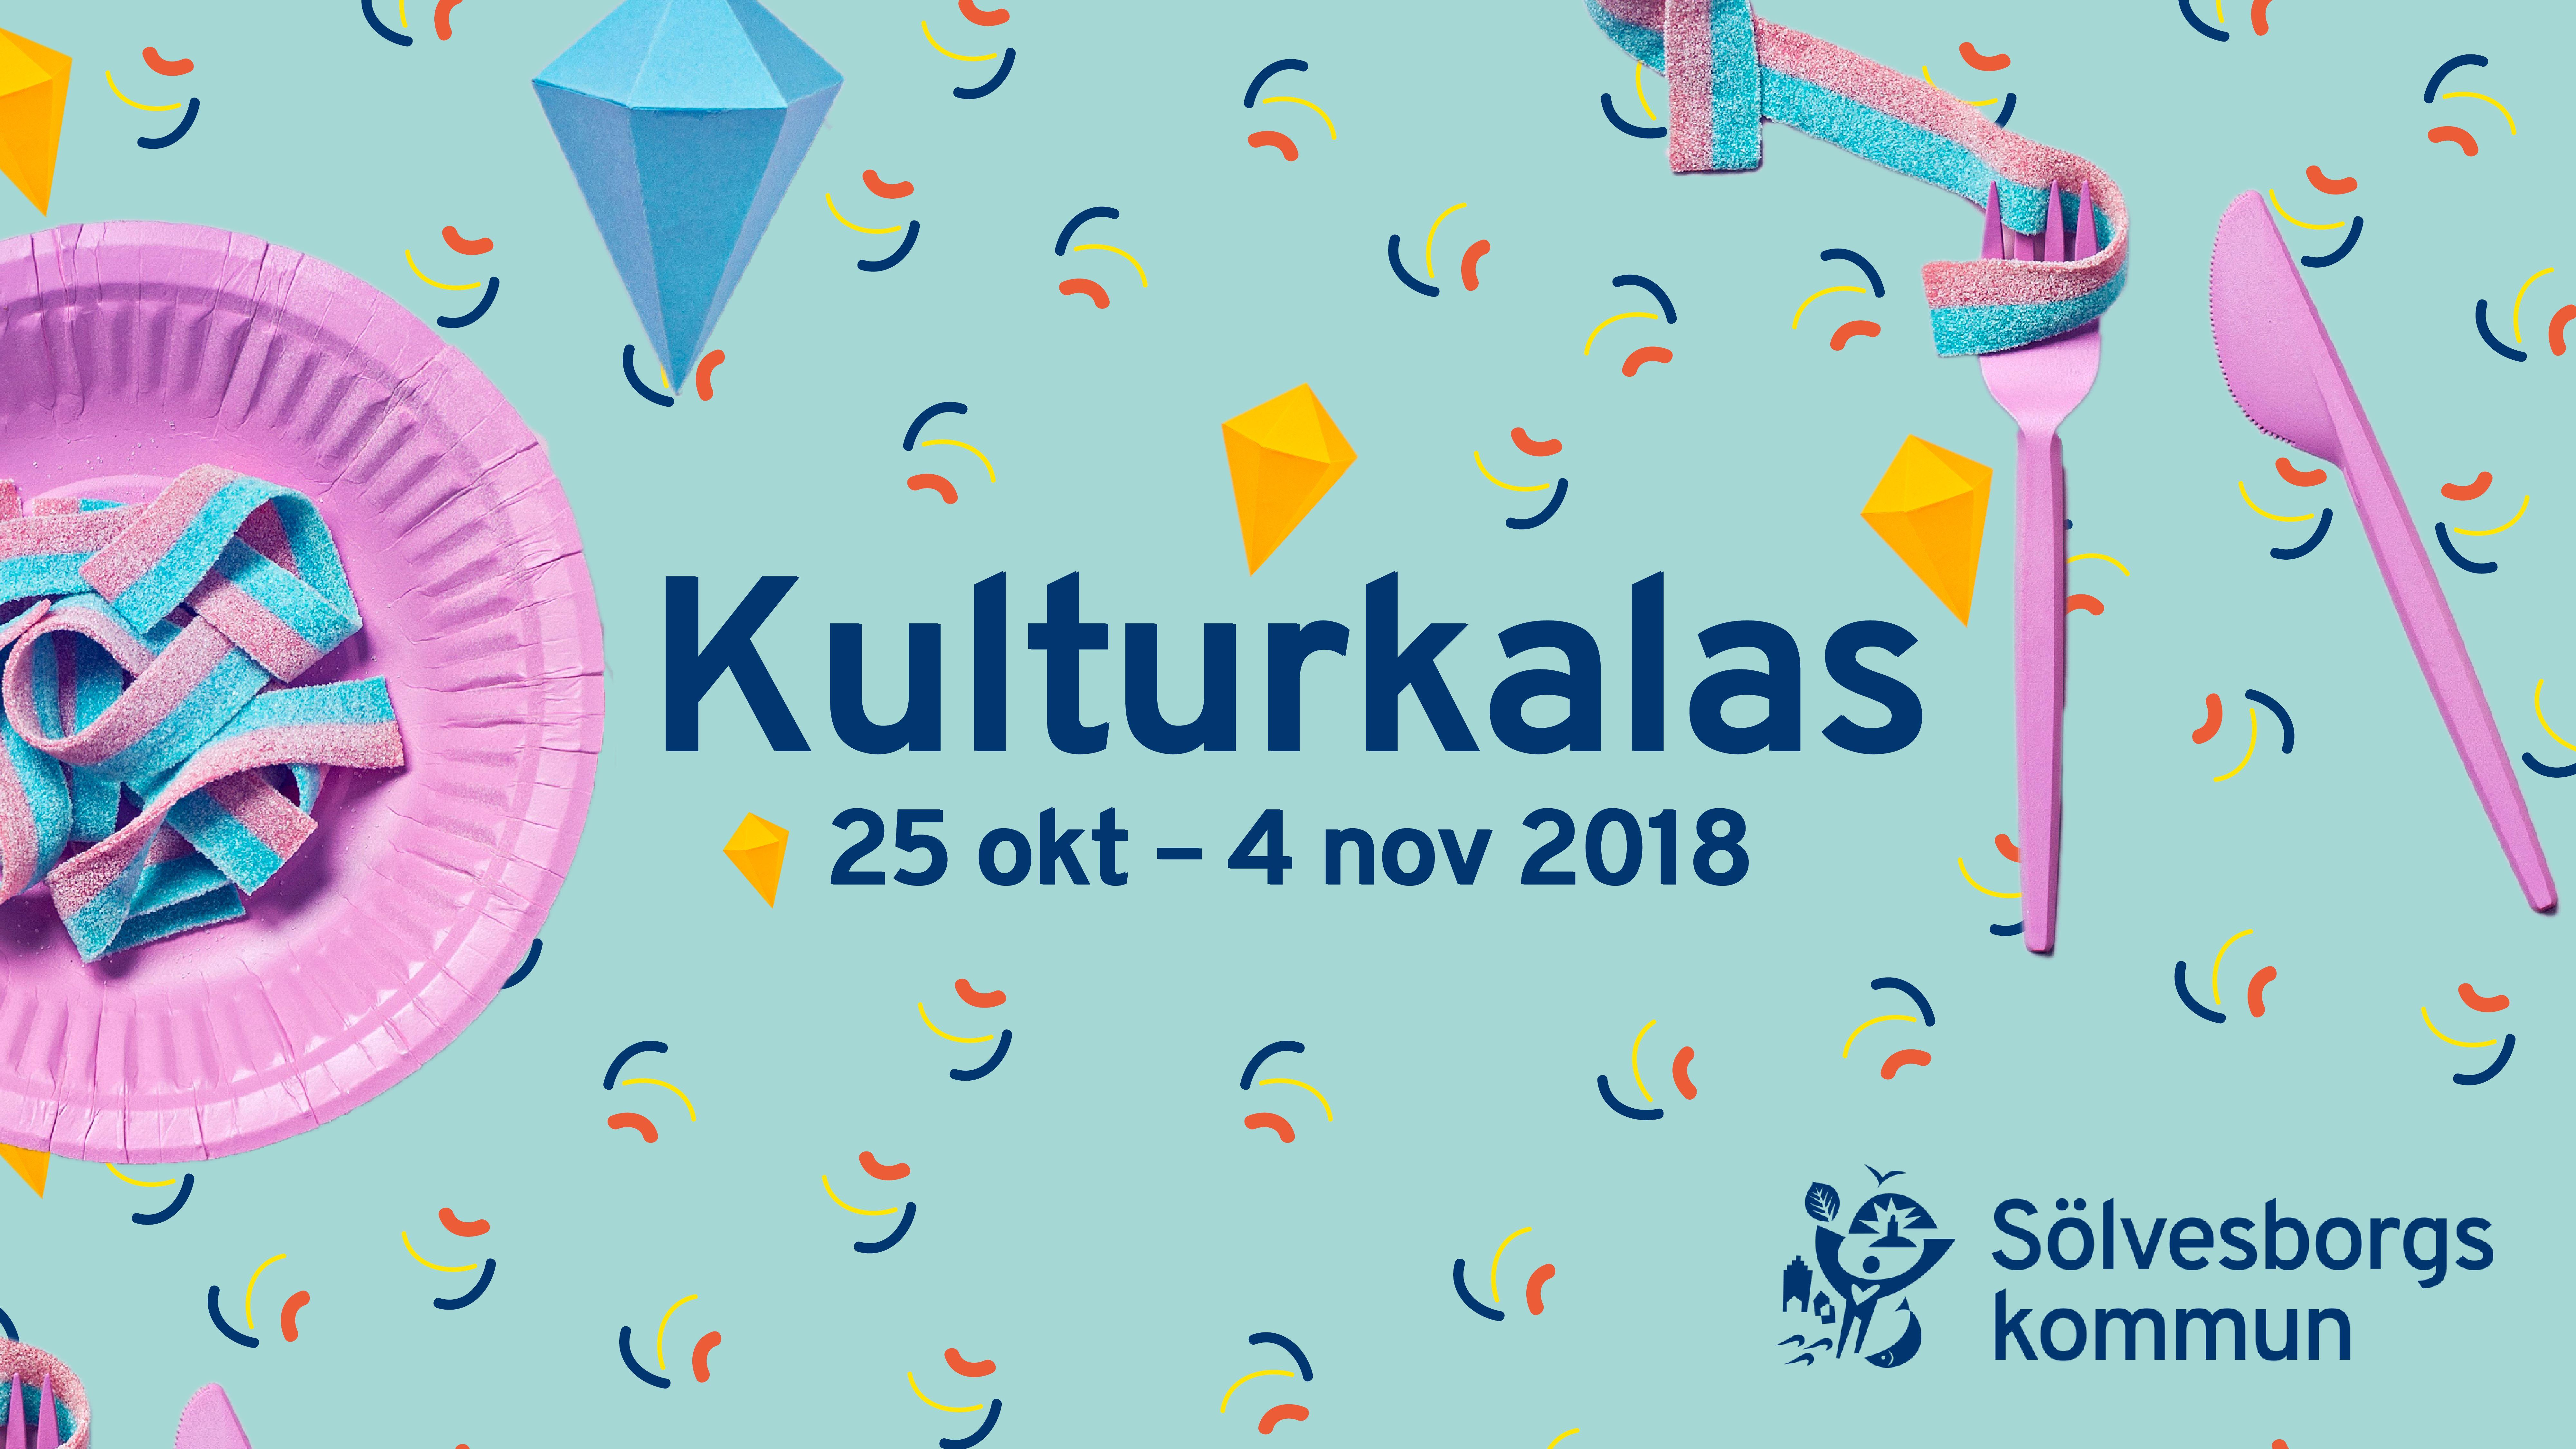 Kulturkalaset 2018